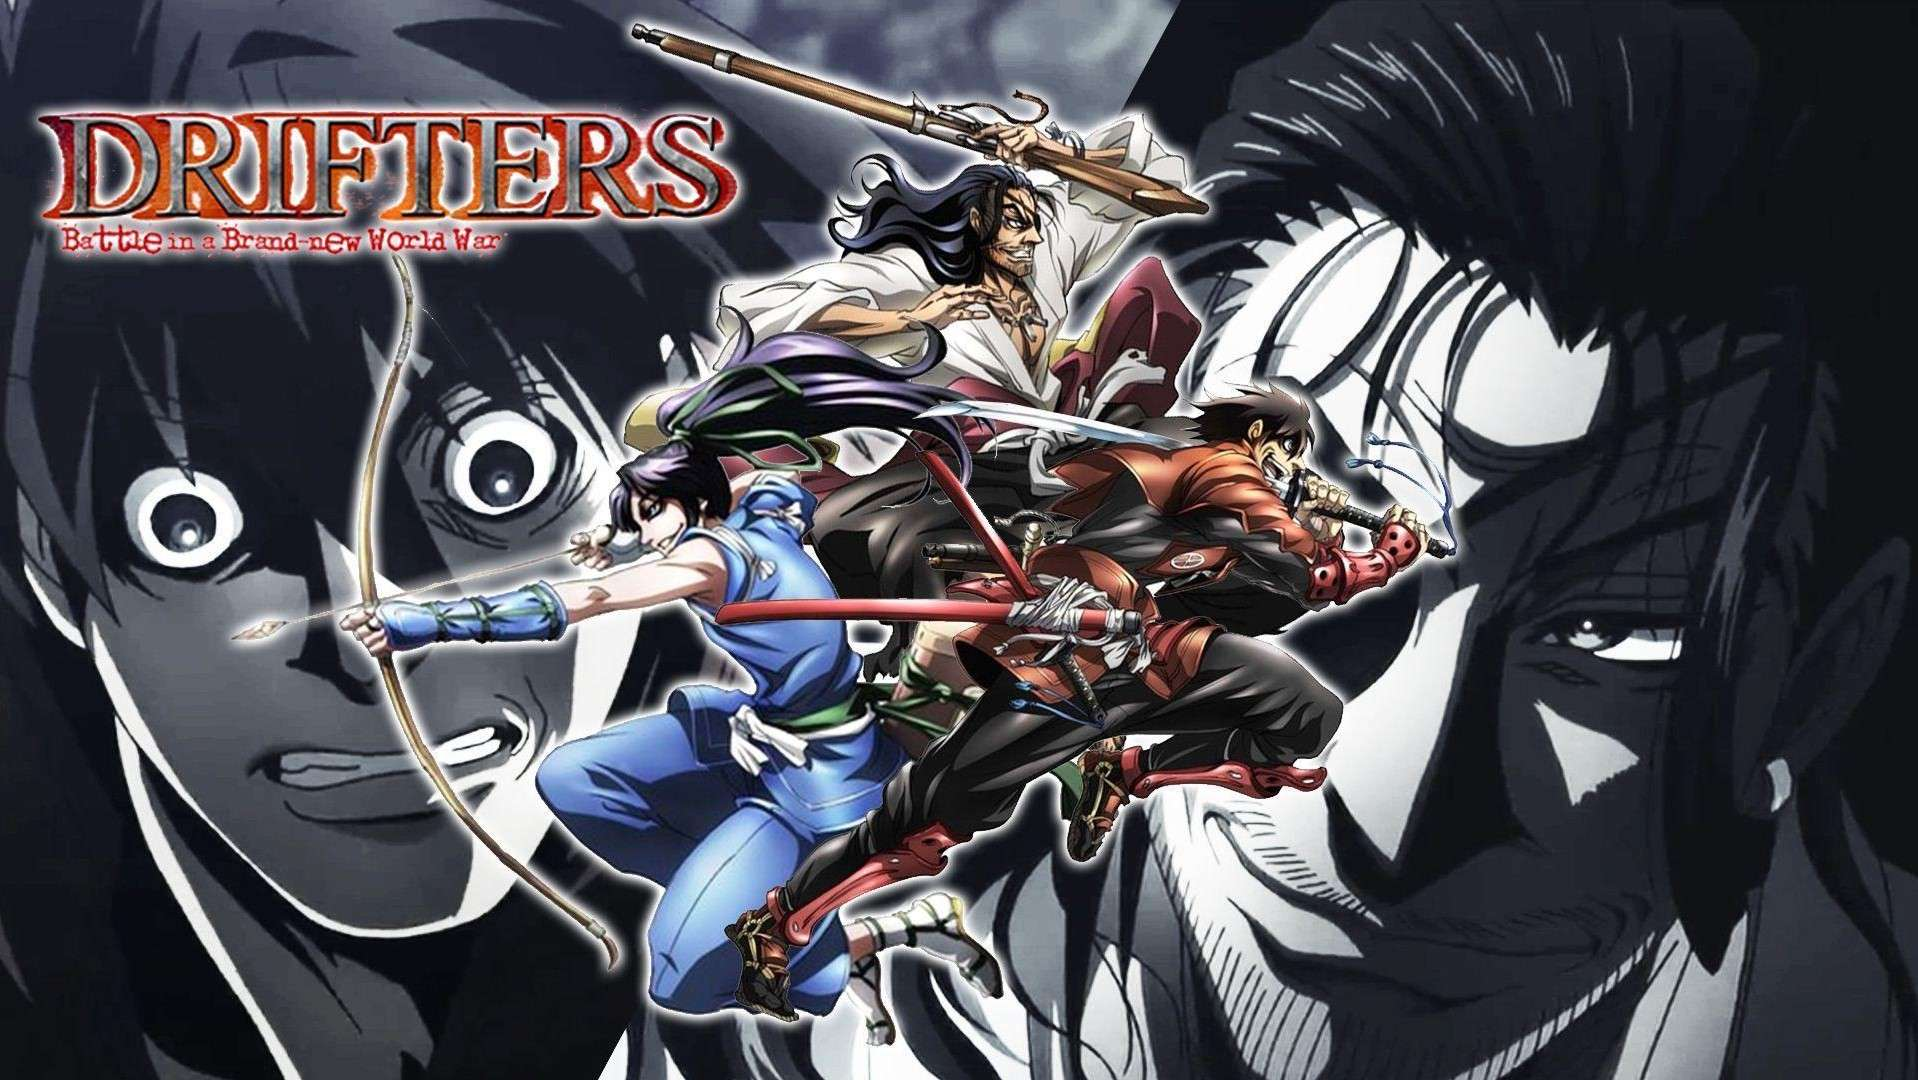 Drifters- anime like overlord